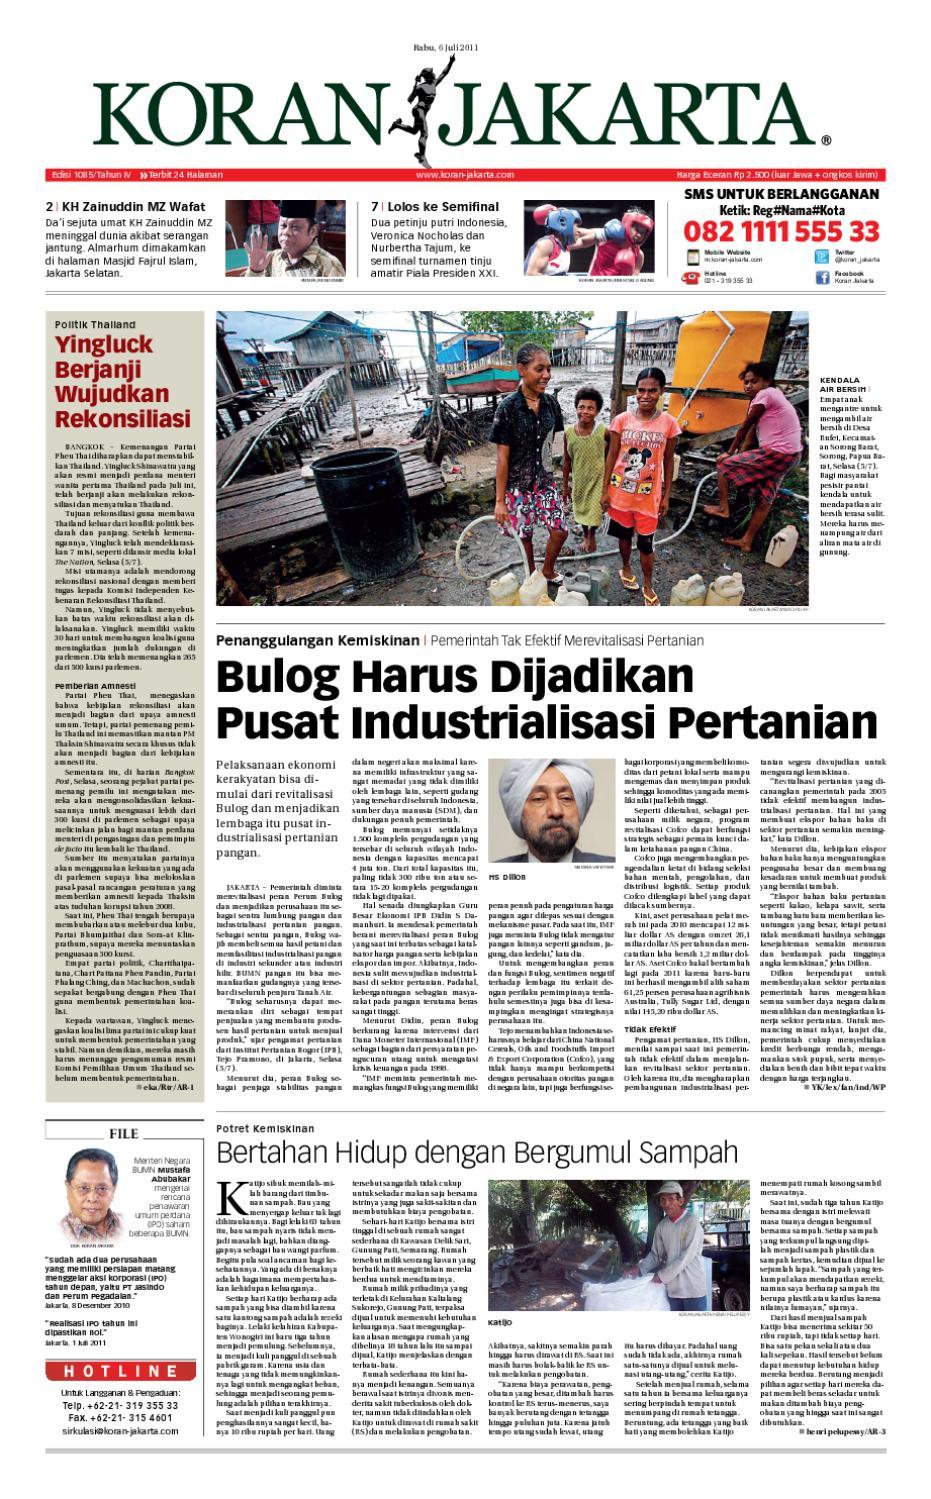 Edisi 1085 06 Juli 2011pdf By Pt Berita Nusantara Issuu Kopi Bubuk Ridha Utama Smg